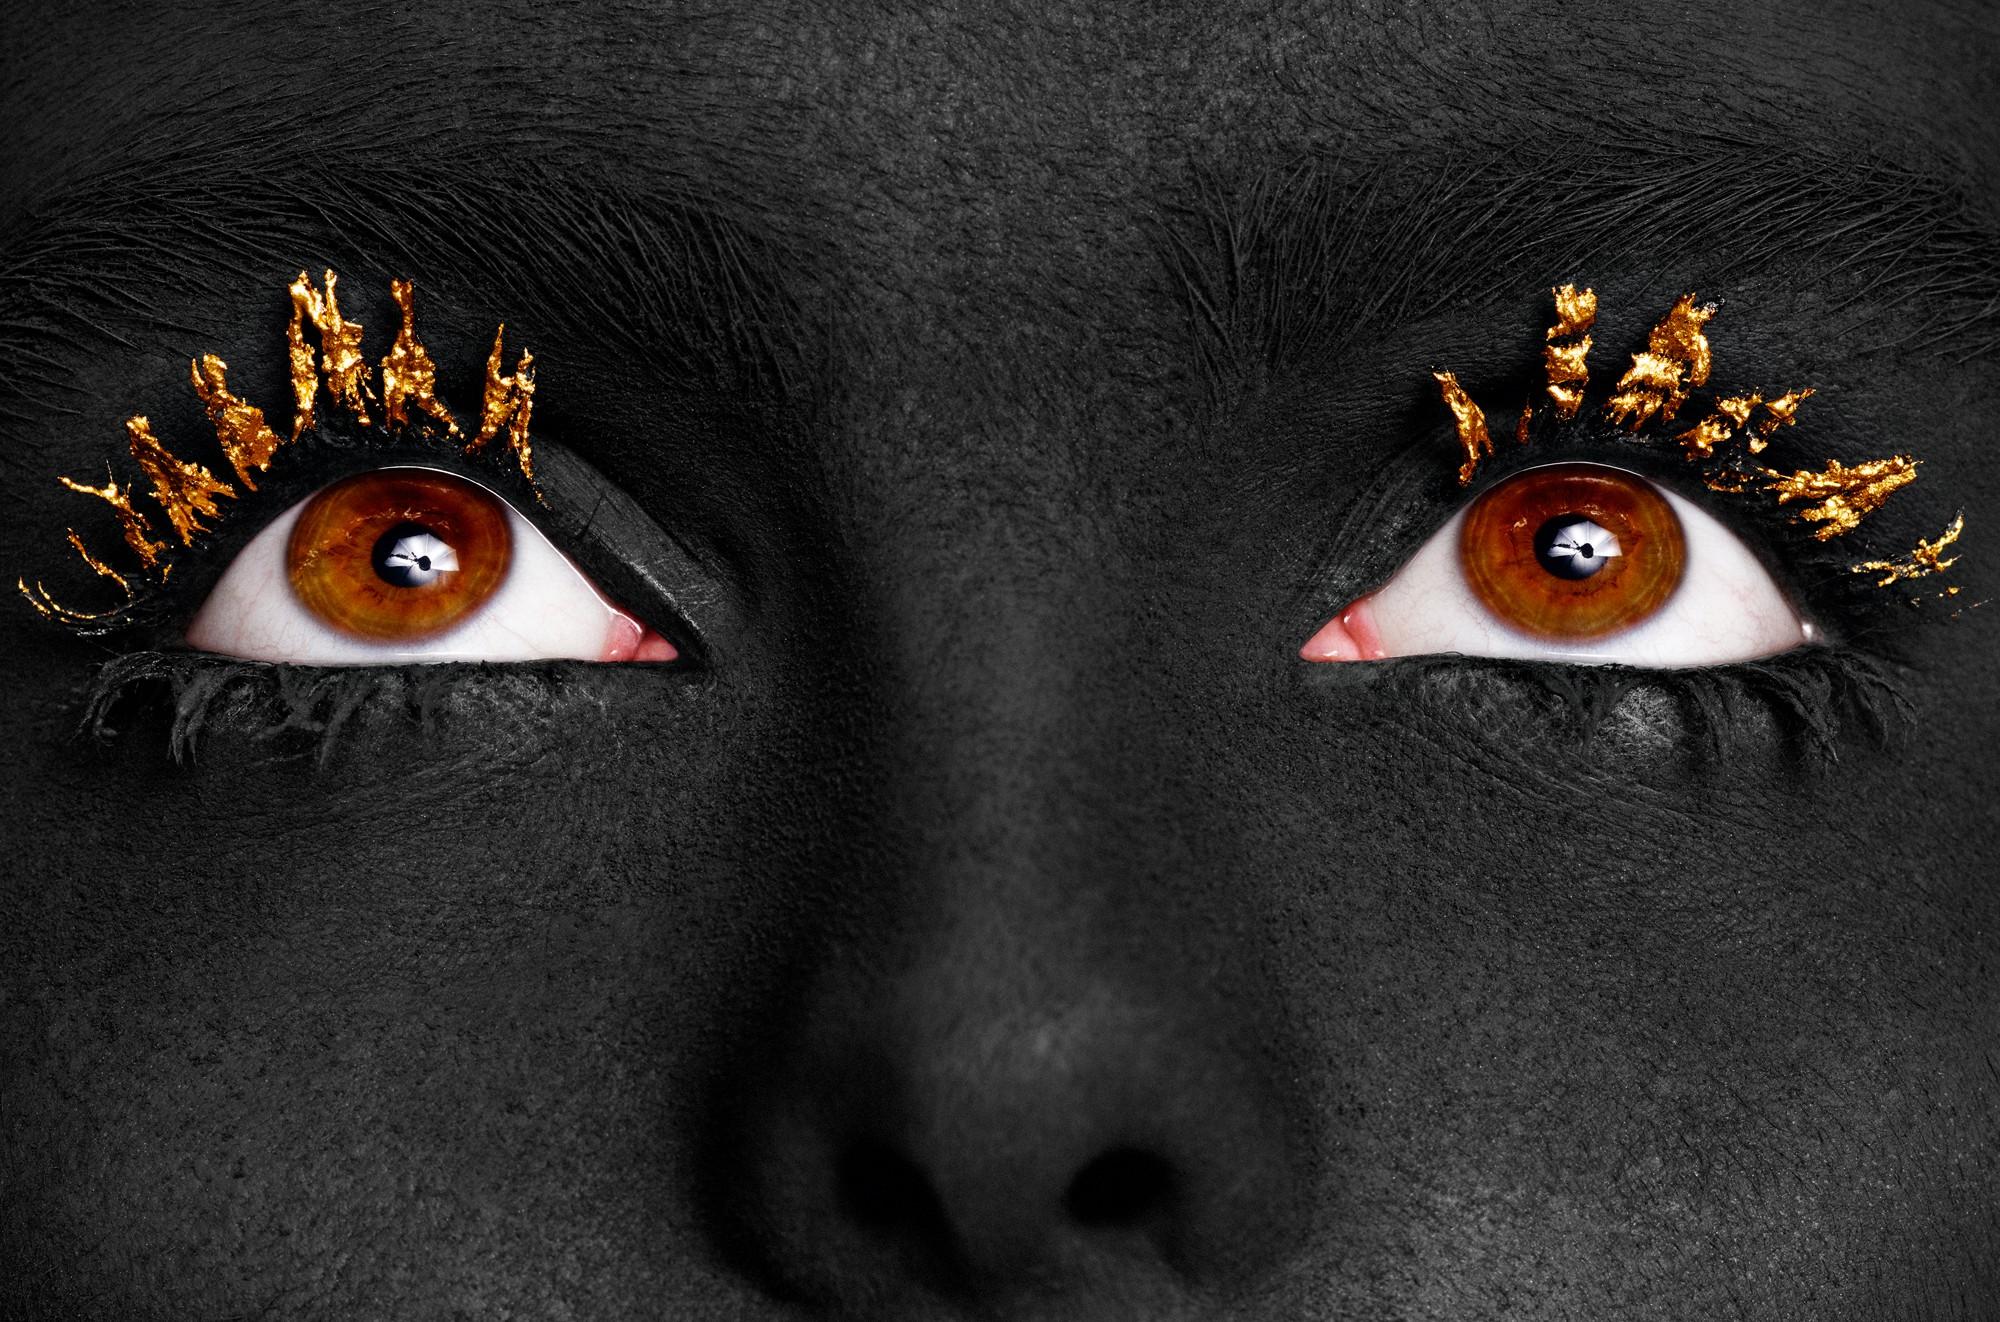 Creme hidratante, Embryolisse; Charcoal Character Powder, Ben Nye; Black Ecstasy Mascara, Giorgio Armani Beauty; Mettalic Powder e Mixing Liquid na cor Gold, Mehron.  (Foto: Baard Lunde)